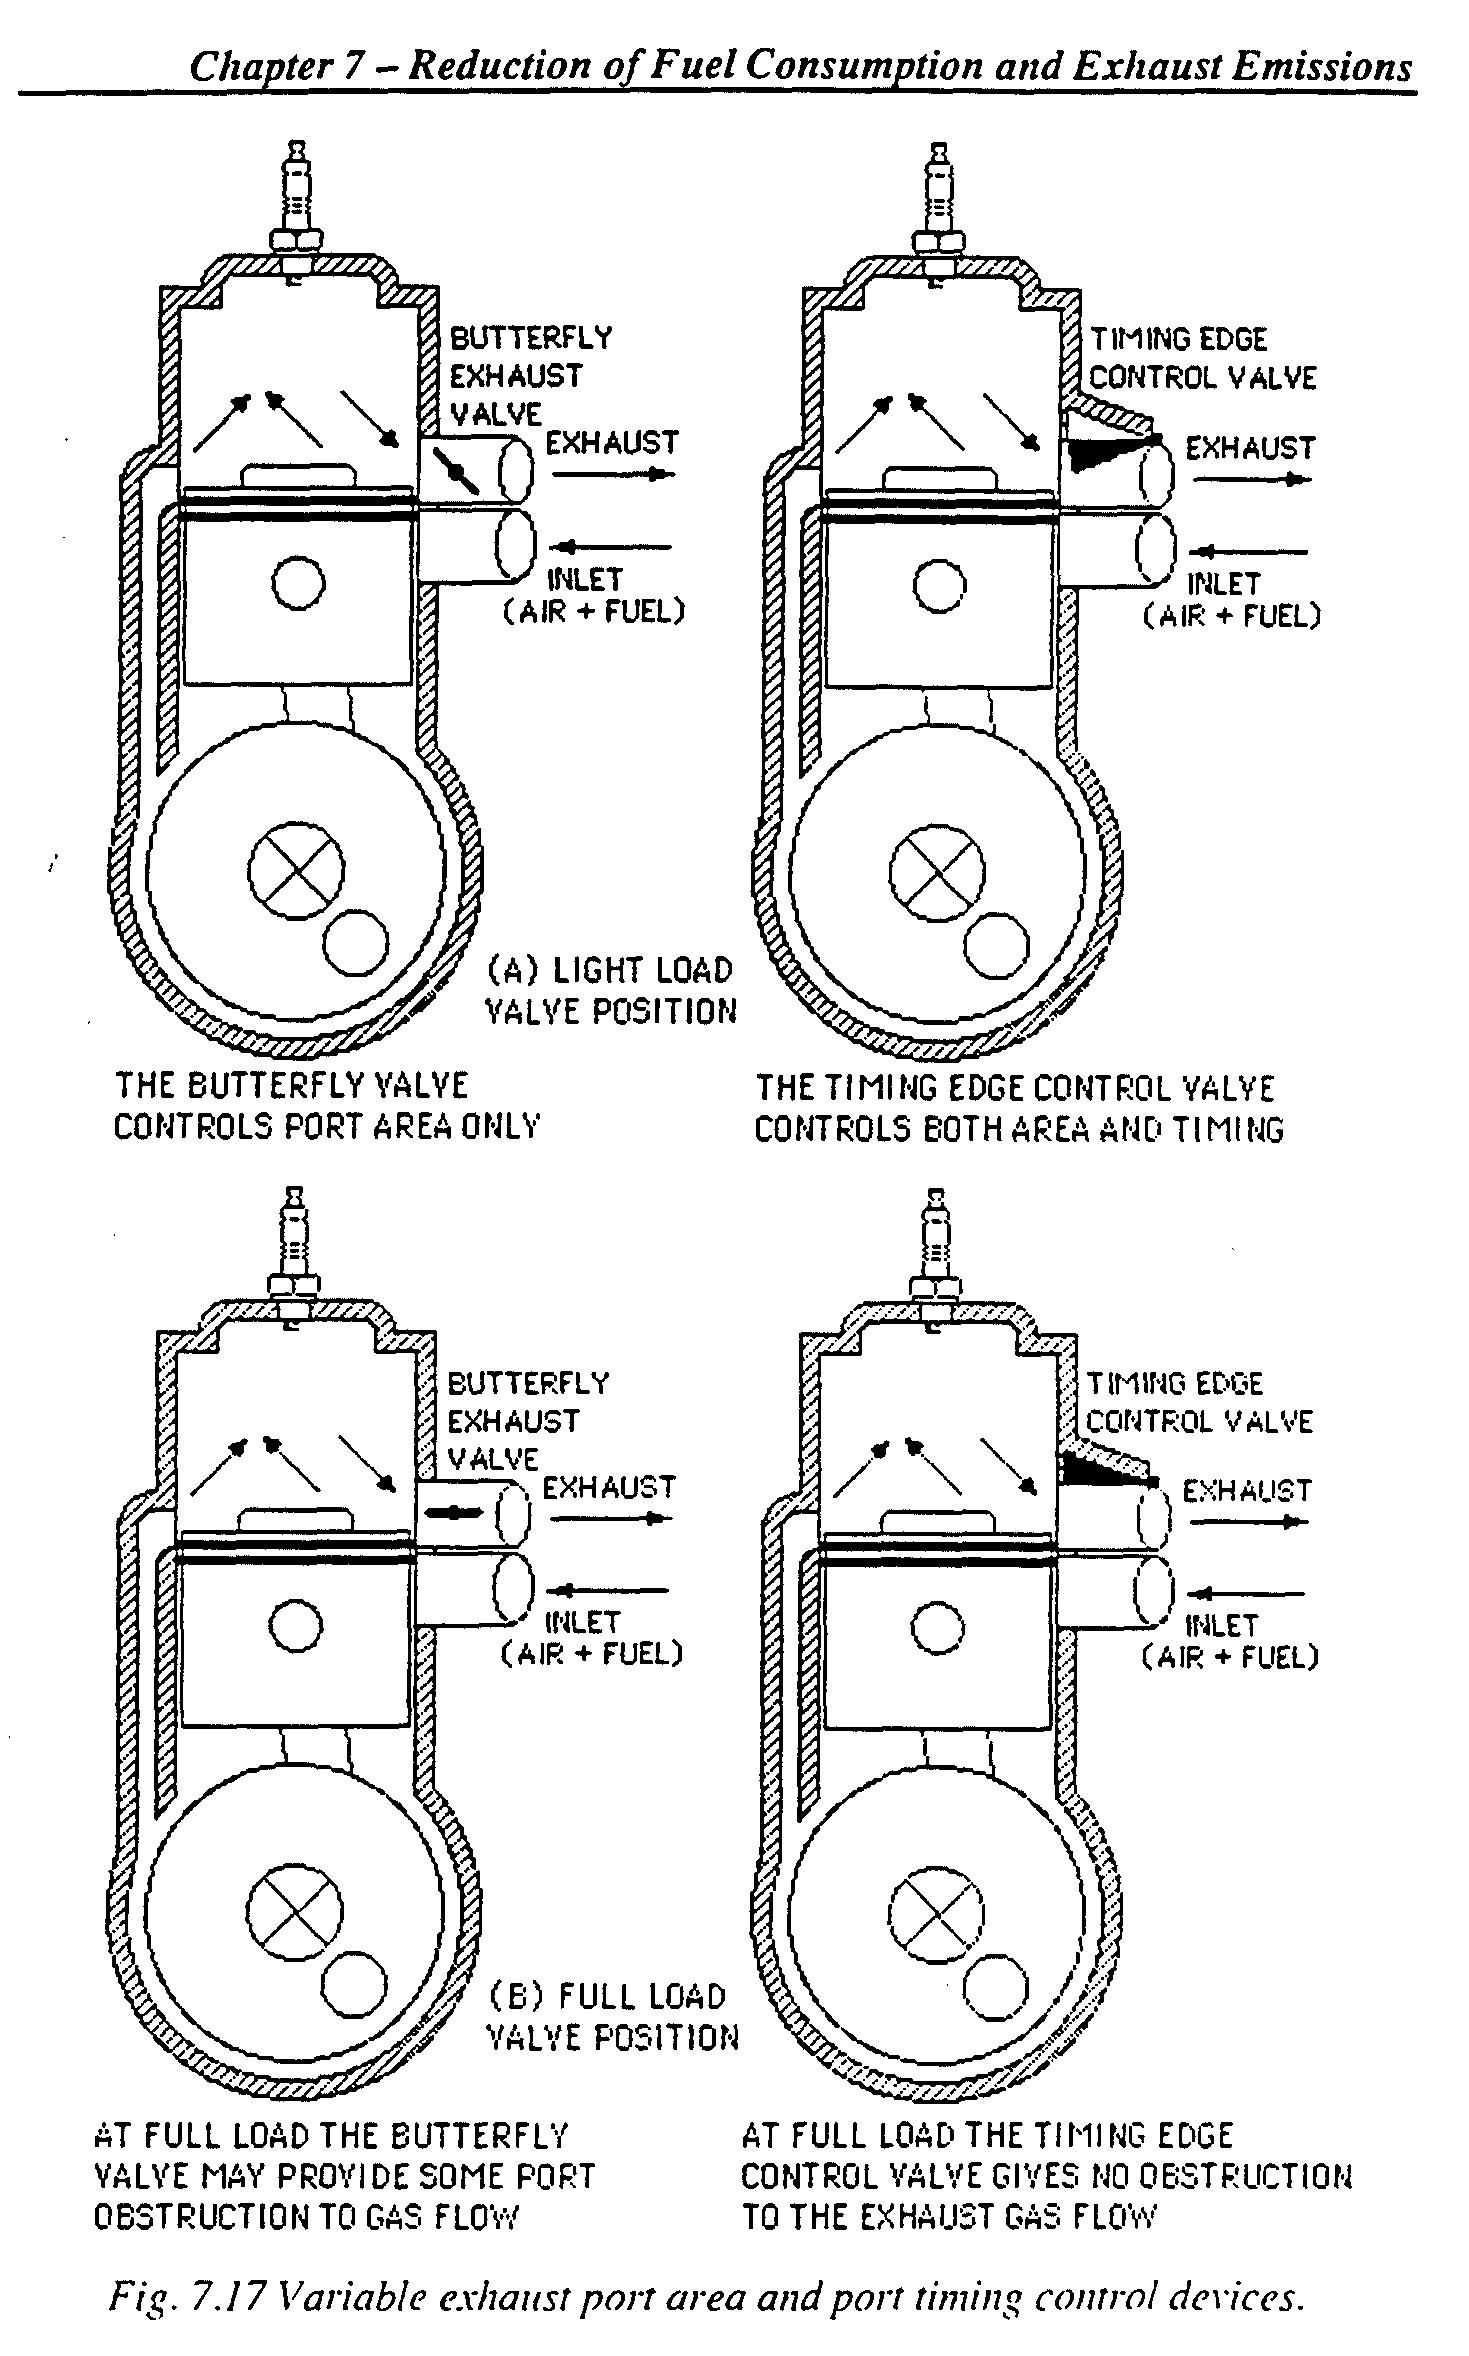 Valve Timing Diagram for Four Stroke Petrol Engine Engine